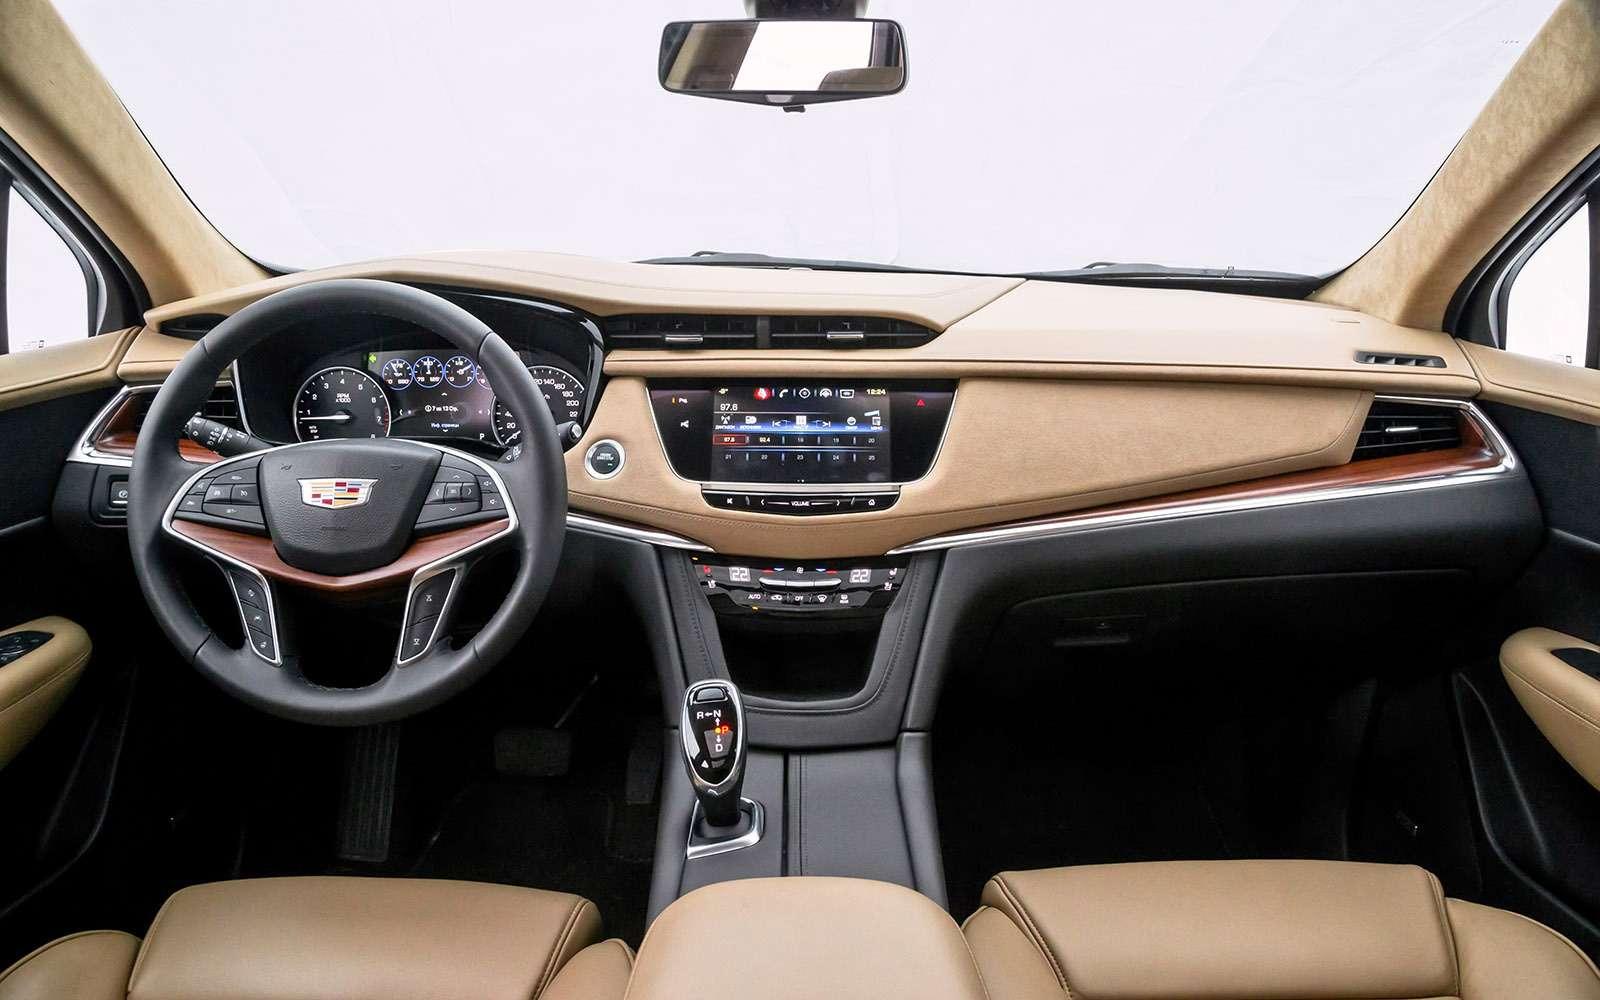 Тест премиум-кроссоверов: Lexus RX350, Cadillac XT5и Jaguar F-Pace— фото 721794